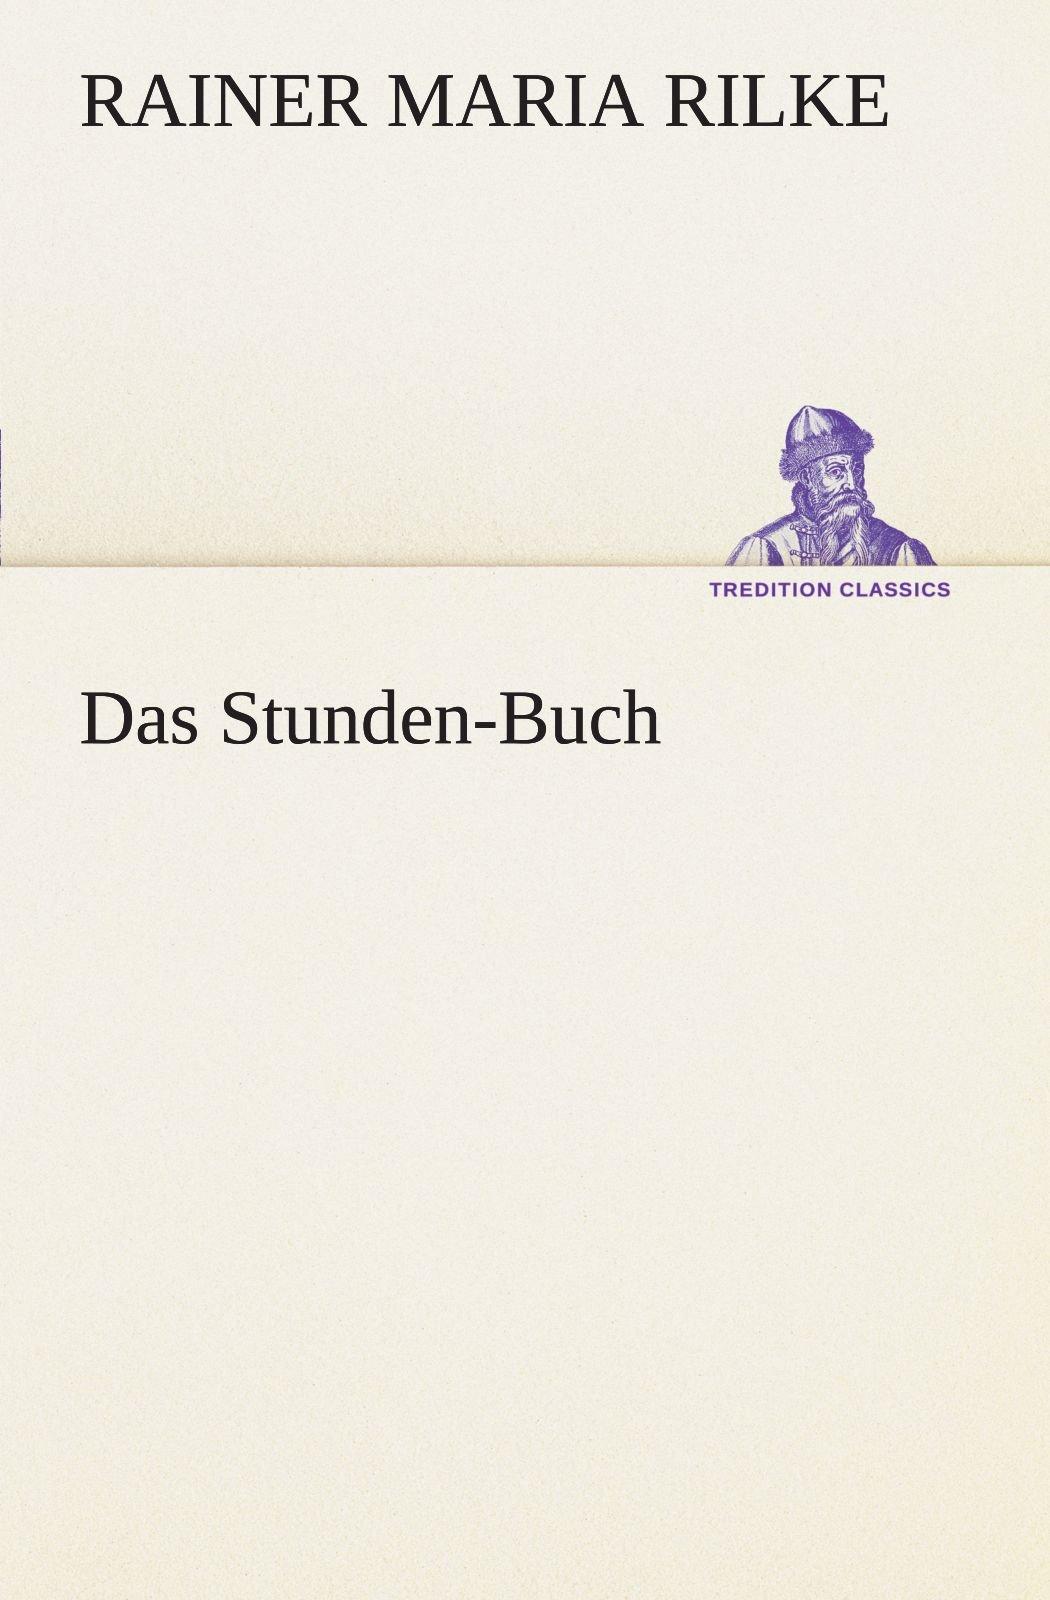 Download Das Stunden-Buch (TREDITION CLASSICS) (German Edition) PDF